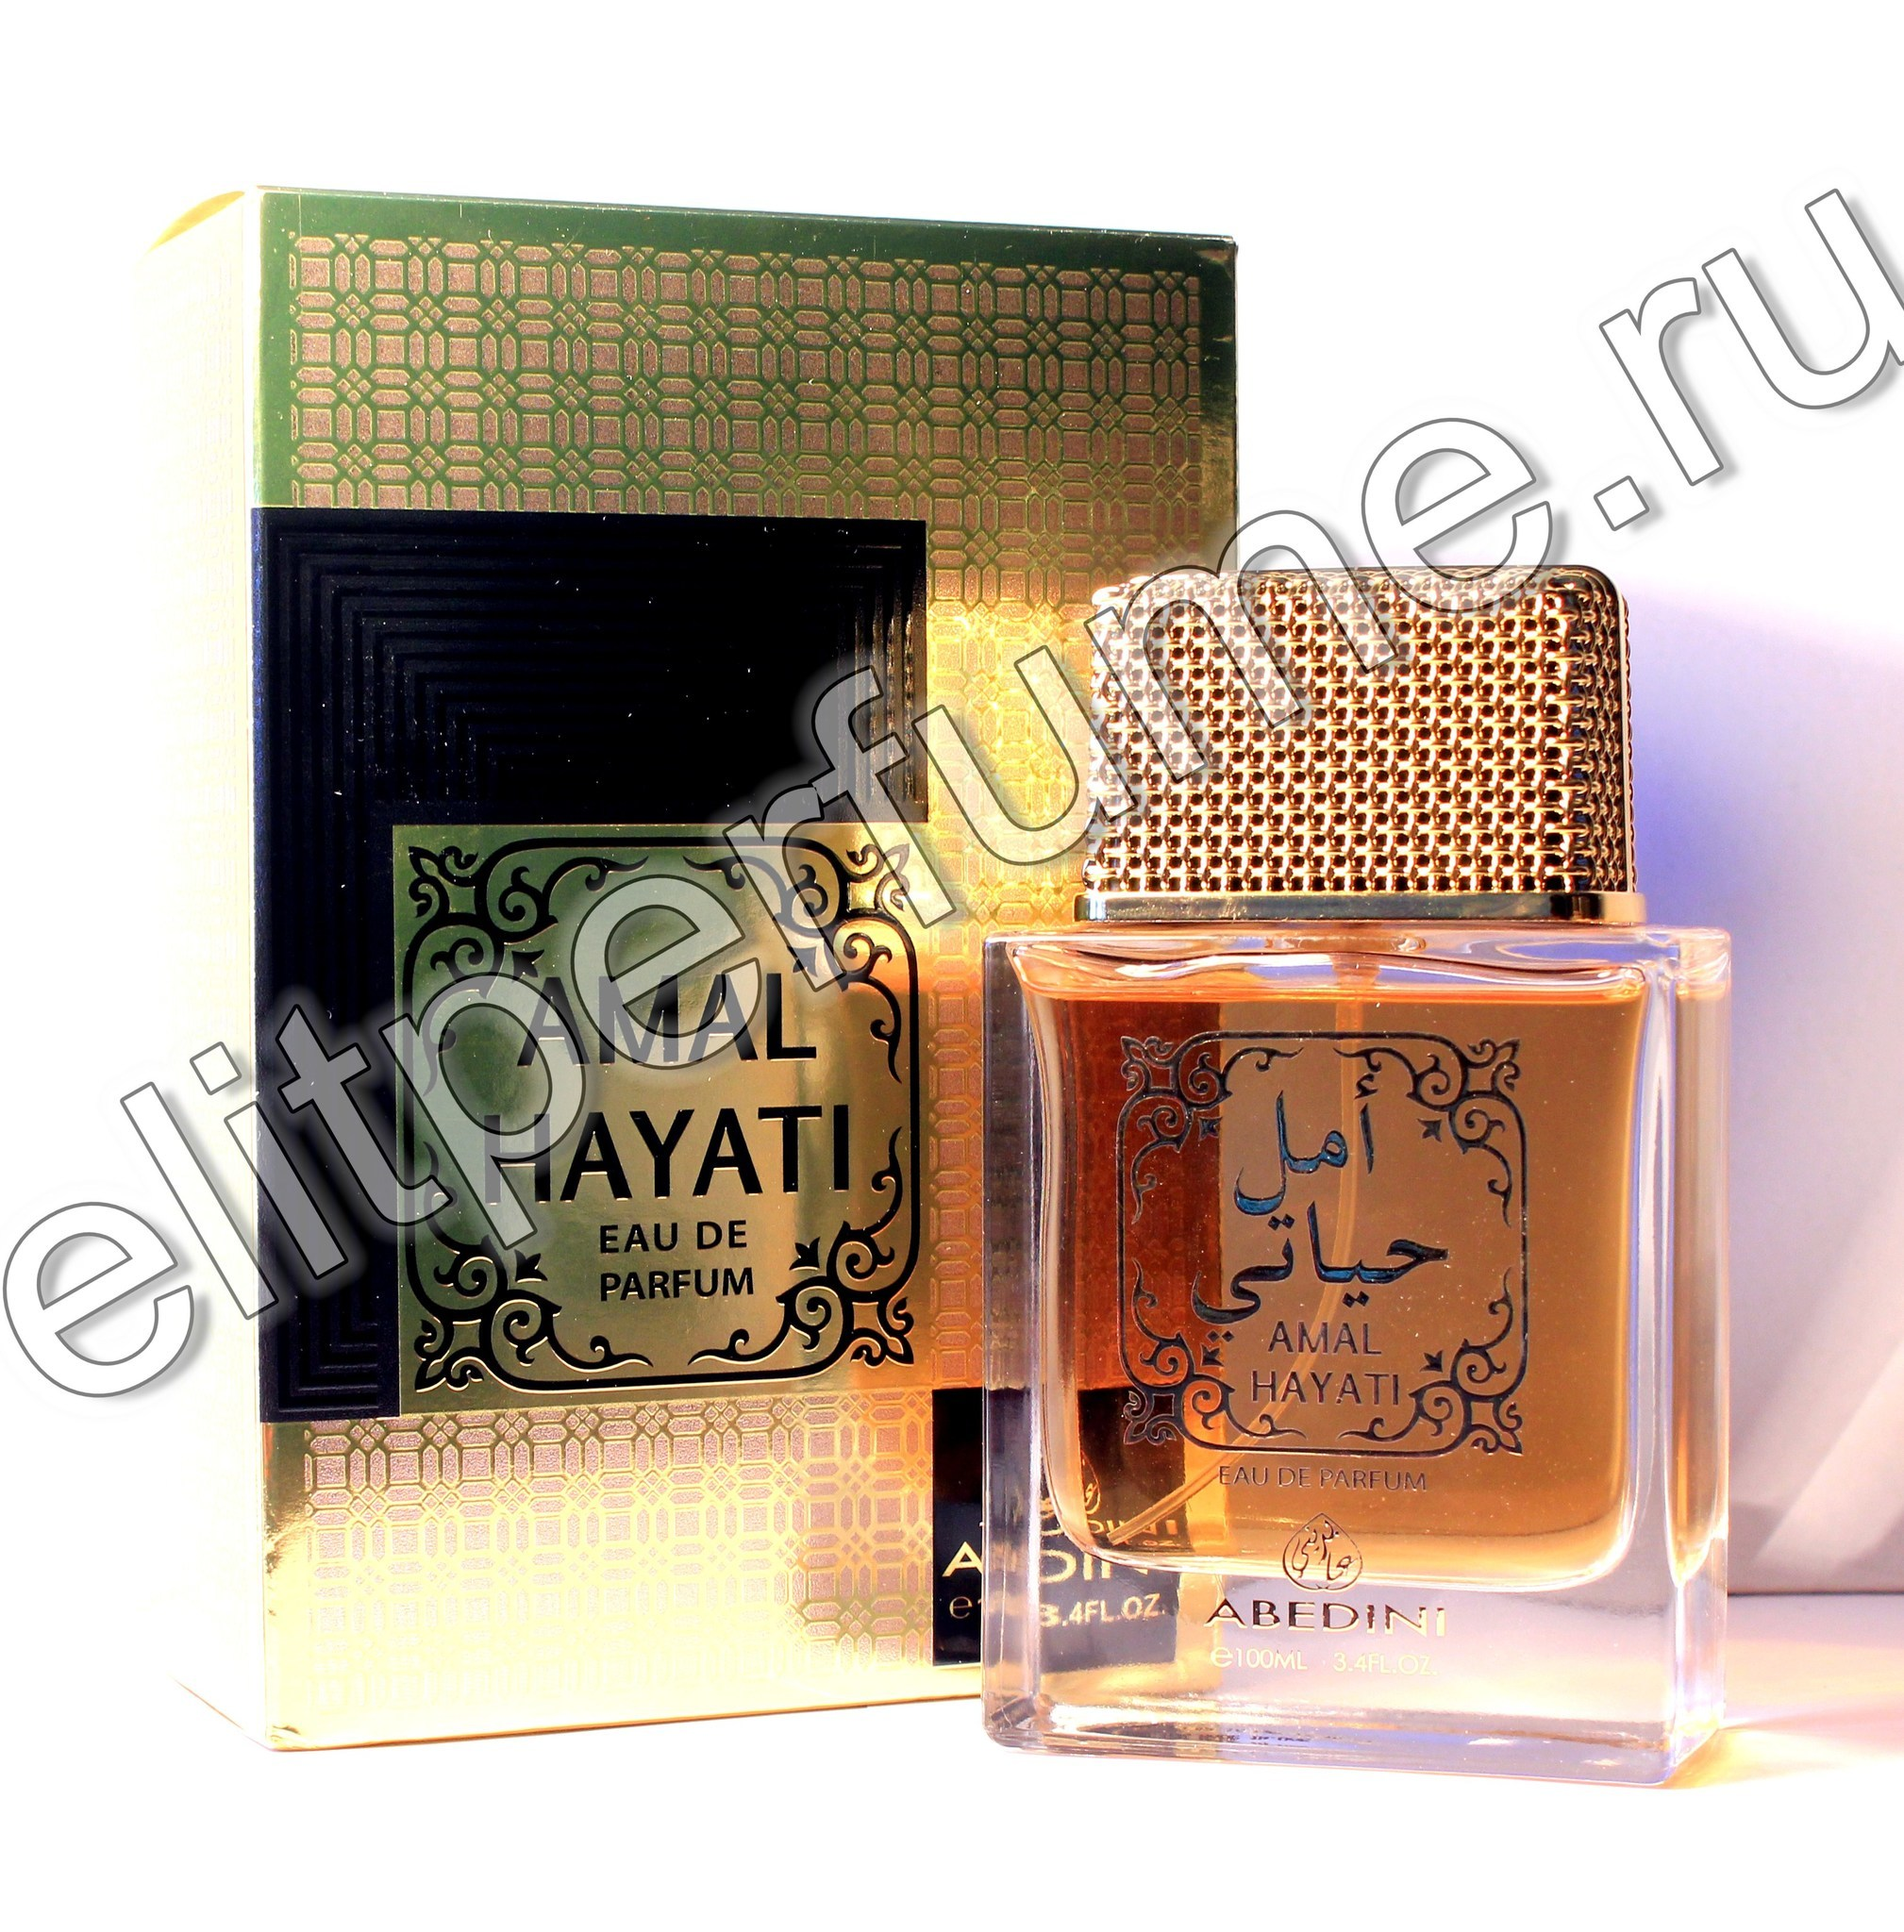 Пробник для Amal Hayati / Амаль Хаяти 1 мл спрей от Халис Khalis Perfumes